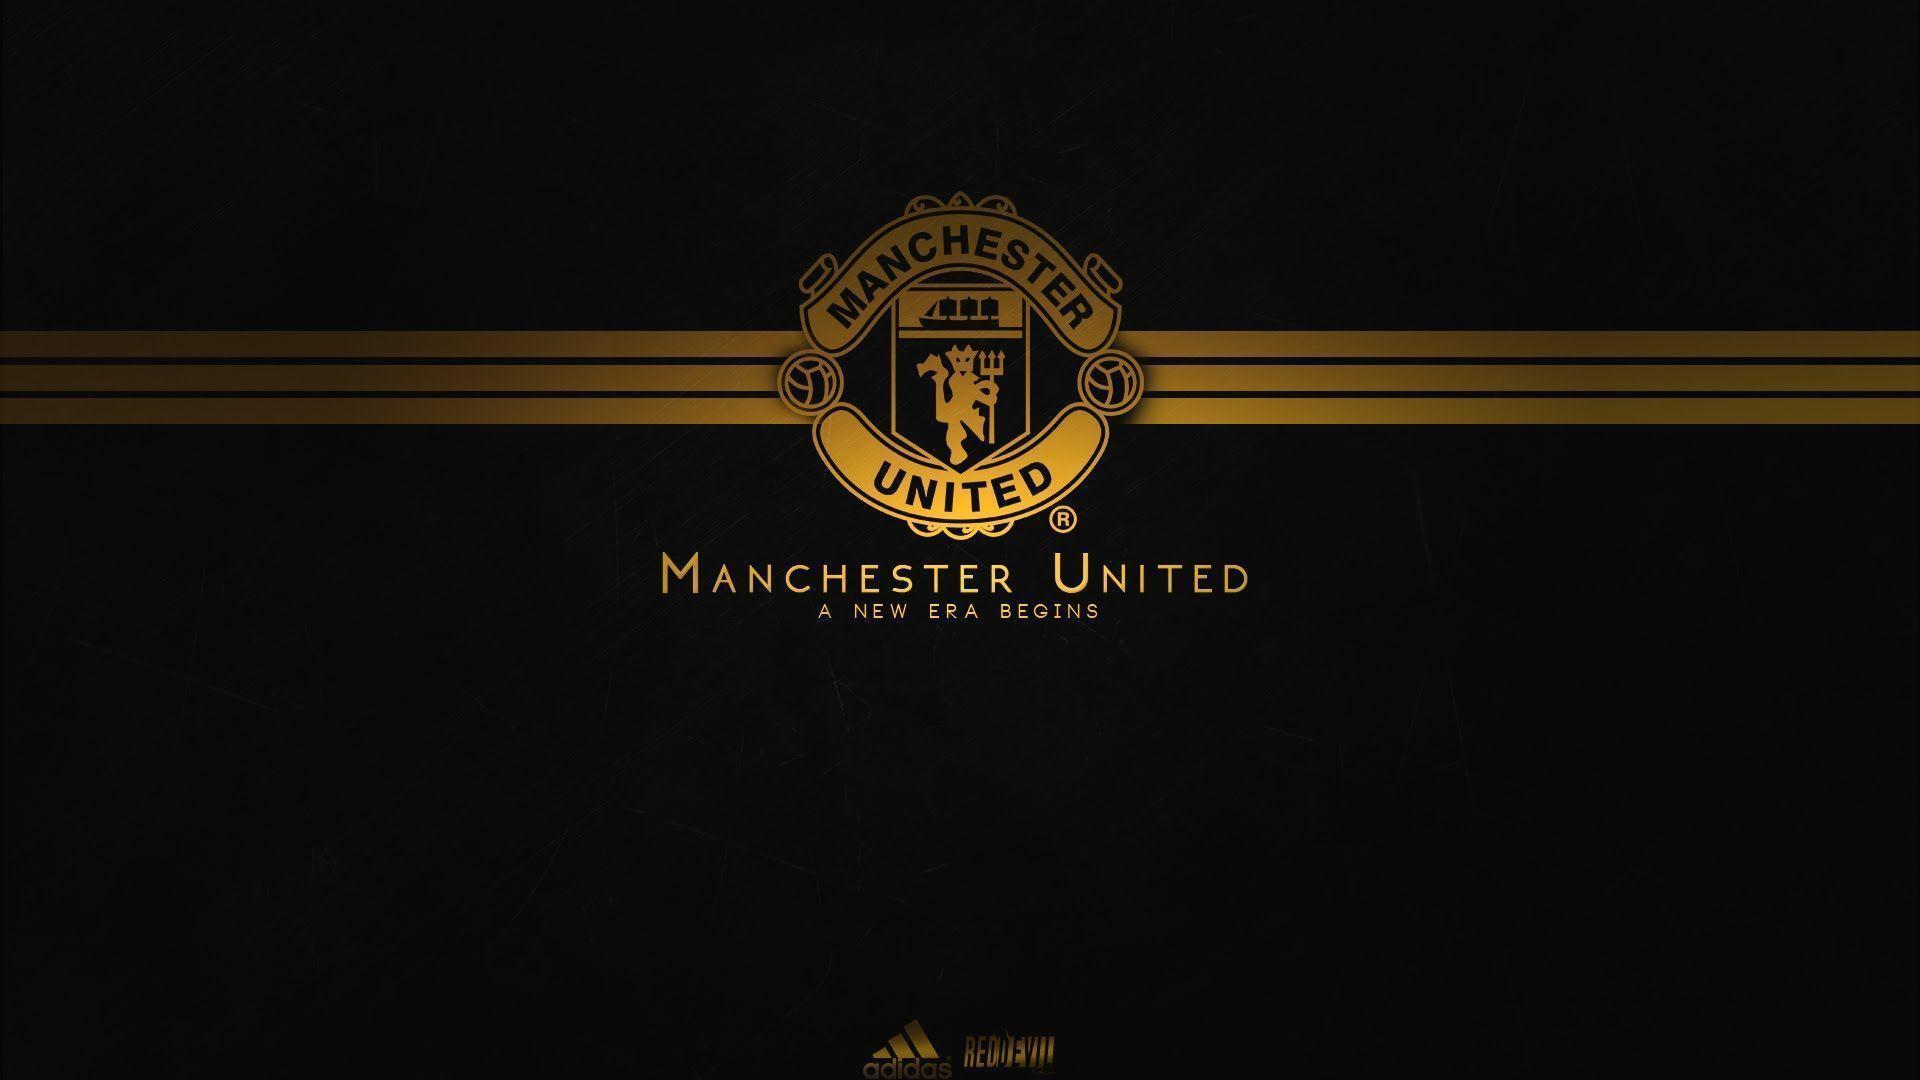 Unduh 66 Wallpaper Manchester United Hitam HD Terbaru